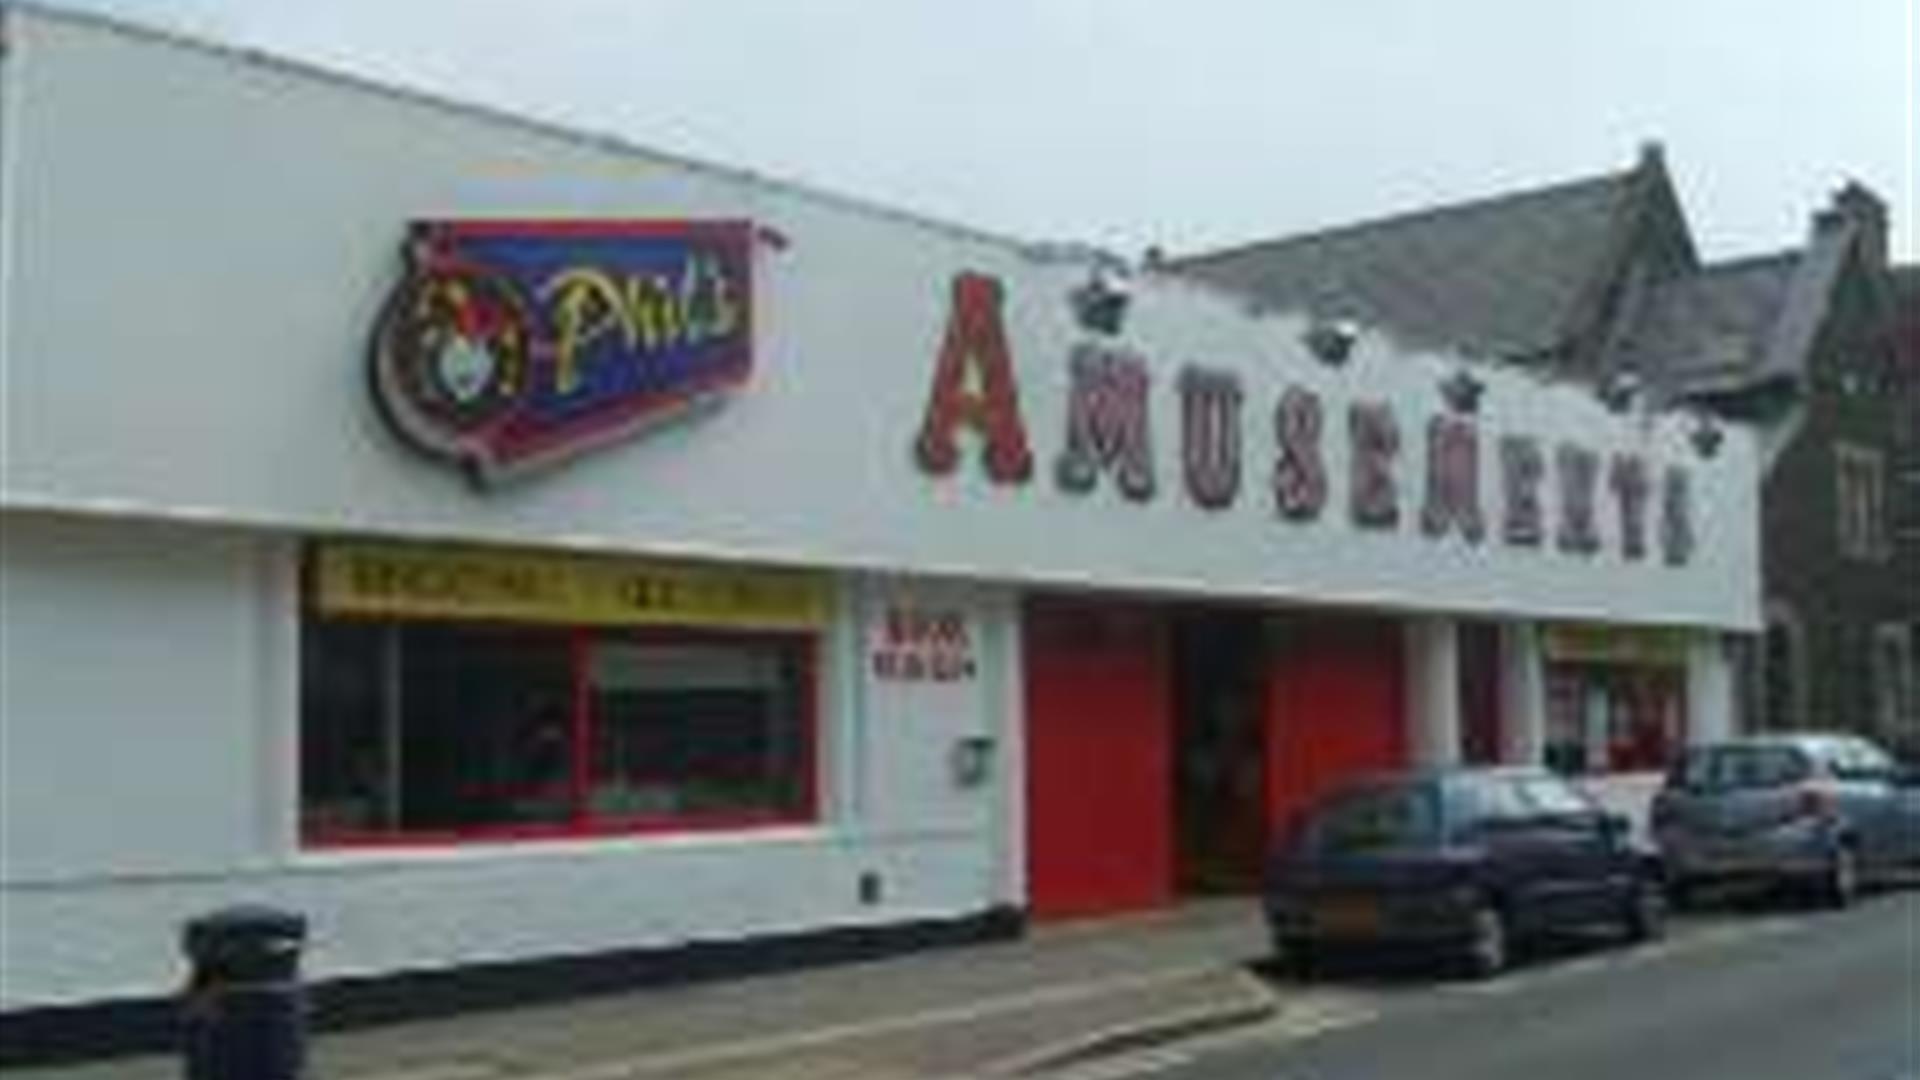 Phils Family Amusements & Bingo Hall